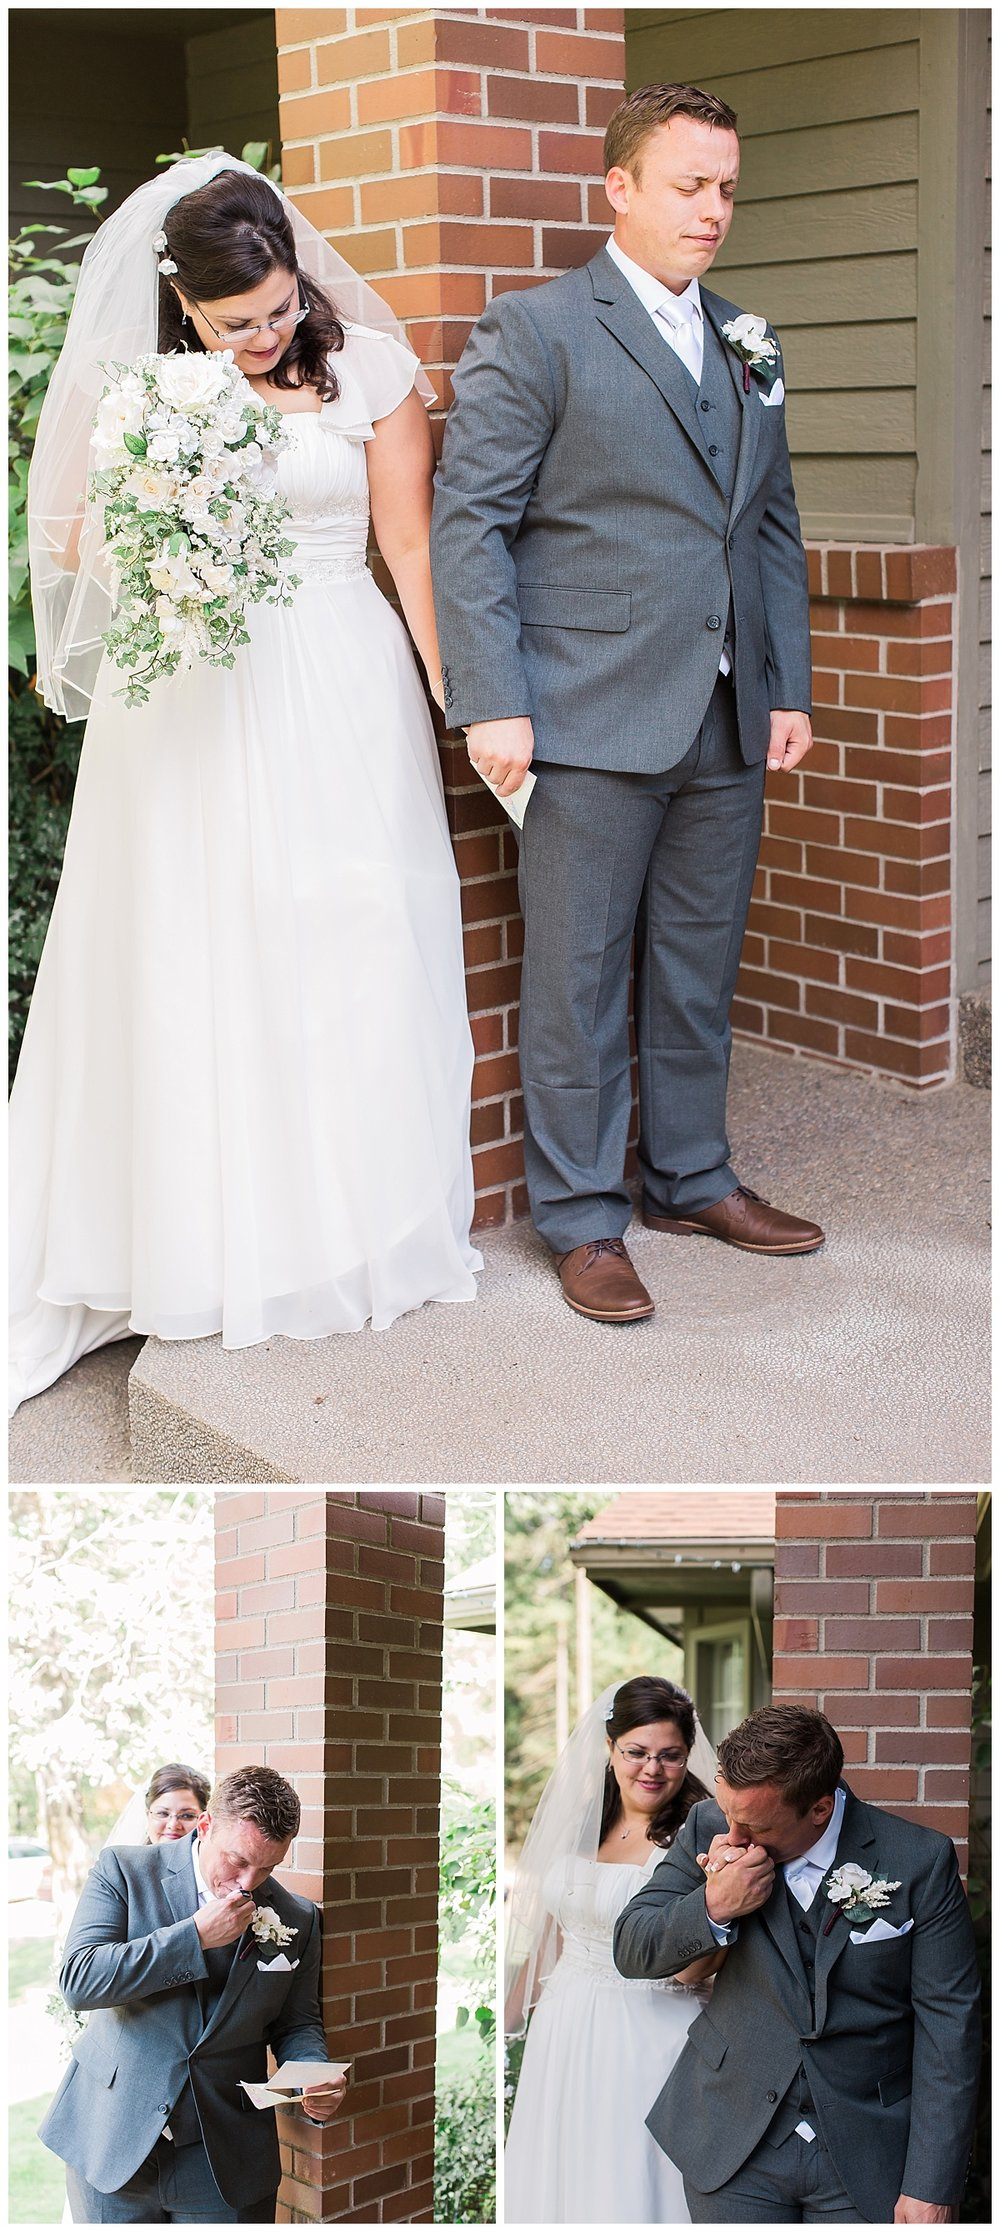 around corner bride and groom